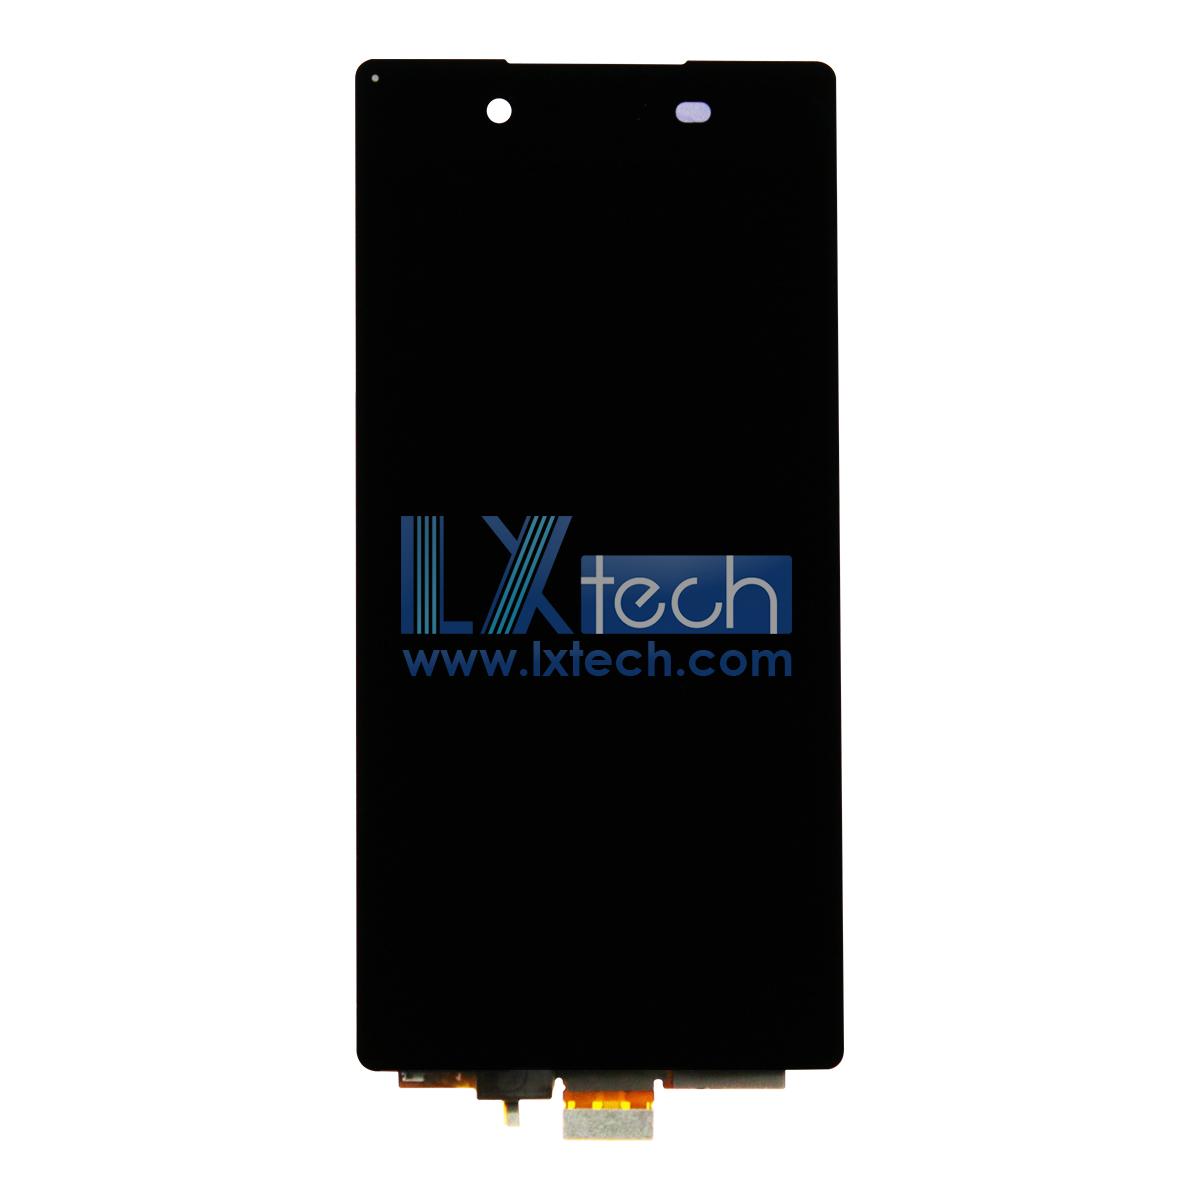 Sony Xperia Z3 Plus LCD Screen Black